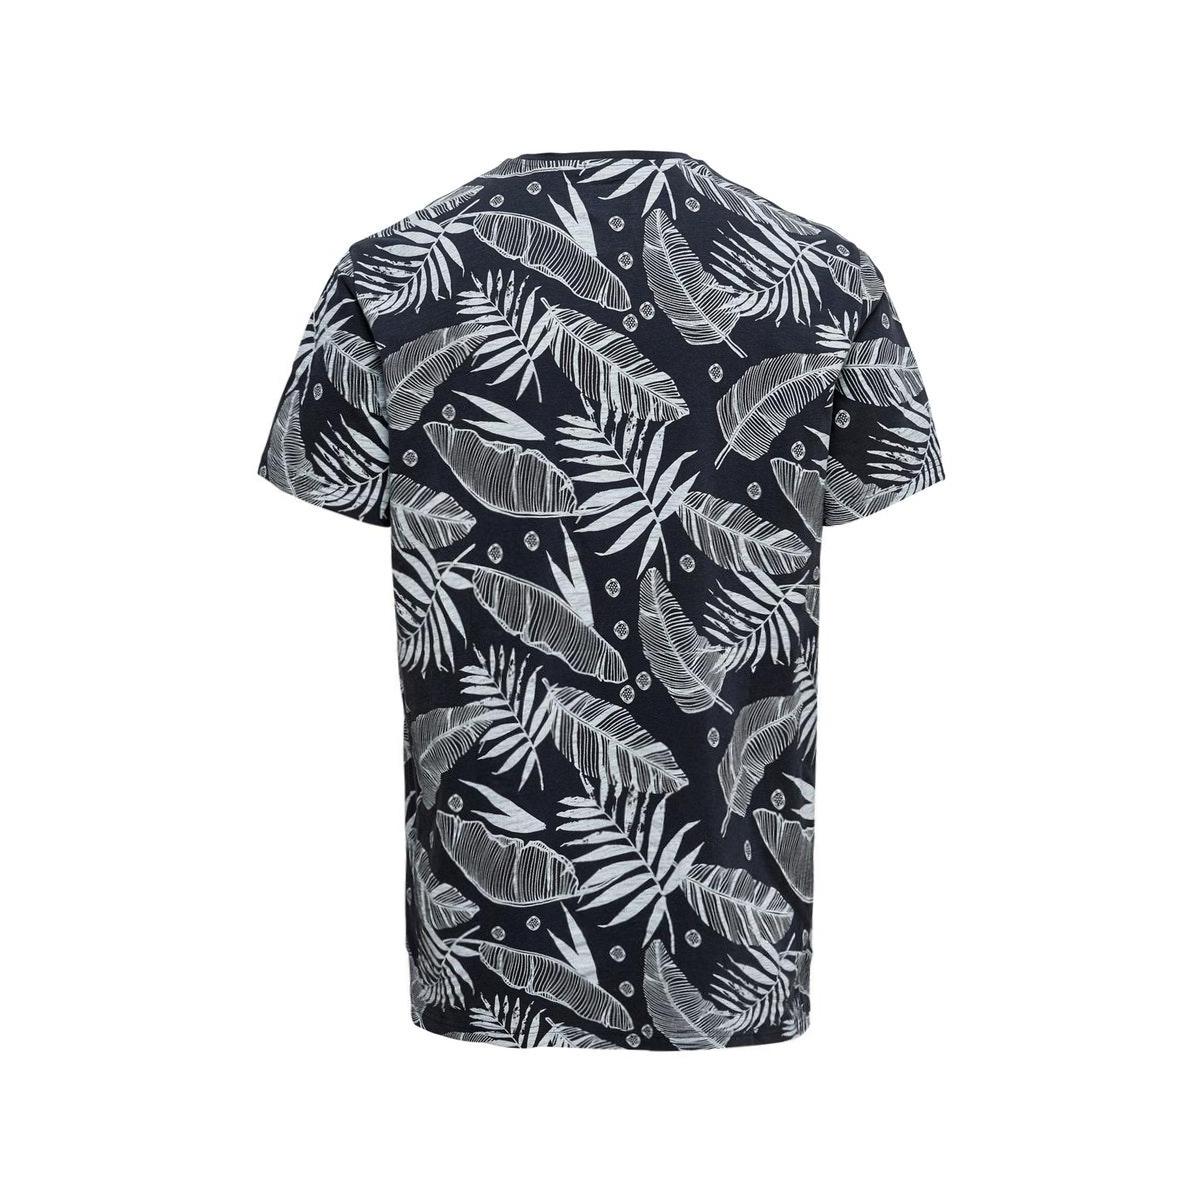 onskiku reg aop ss tee 22016073 only & sons t-shirt dark navy